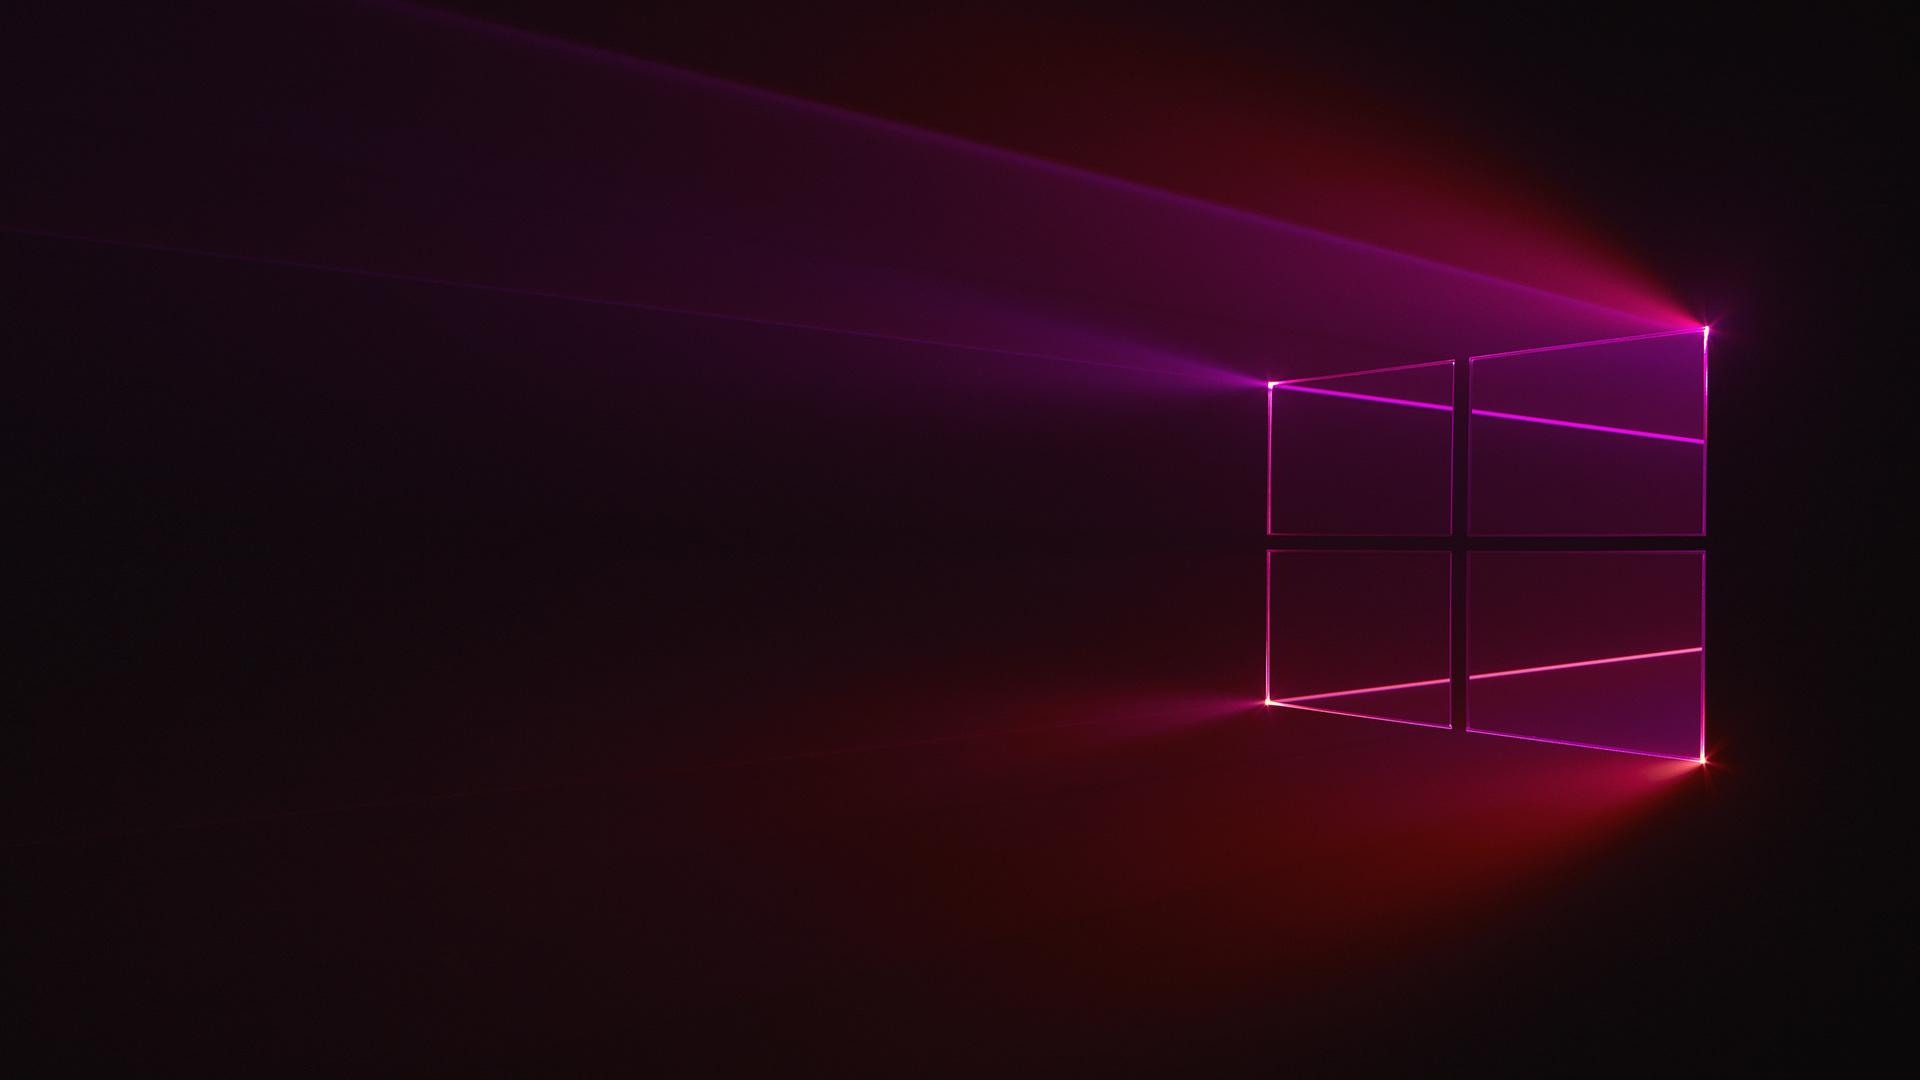 1920x1080 Windows 10 Glass Background Laptop Full HD 1080P ...